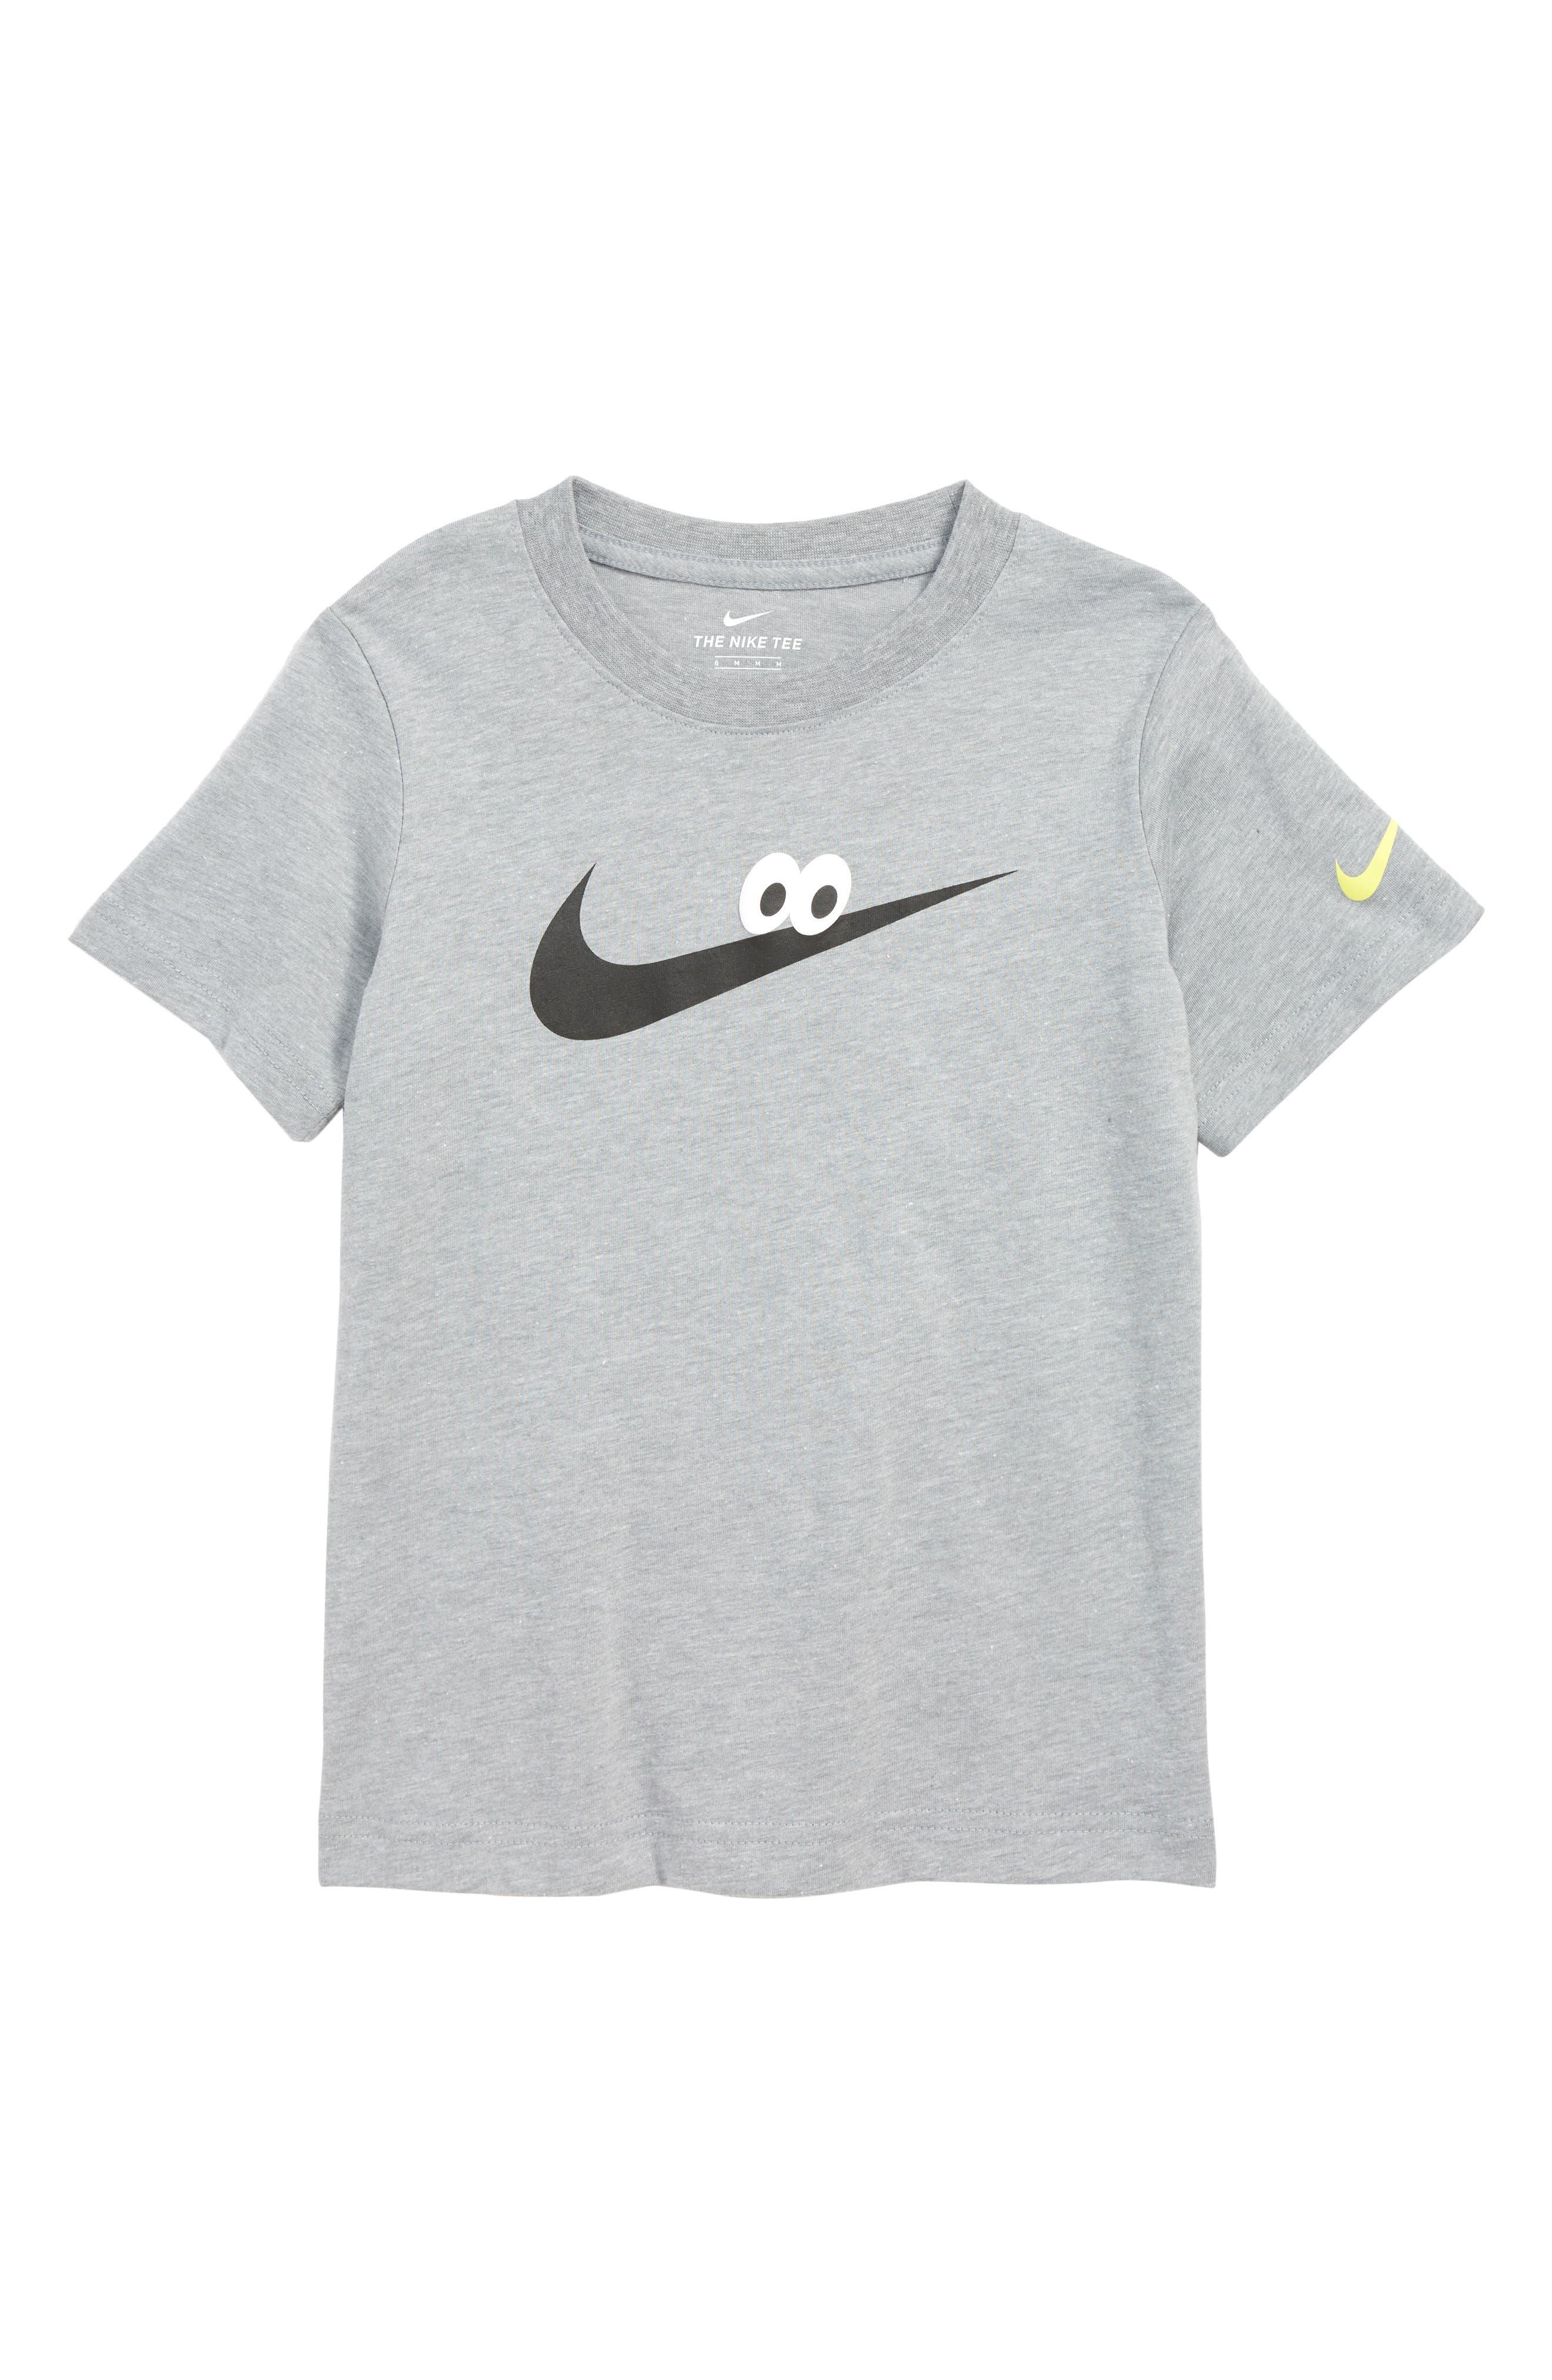 Googly Eyes Swoosh T-Shirt,                             Main thumbnail 1, color,                             DK GREY HEATHER